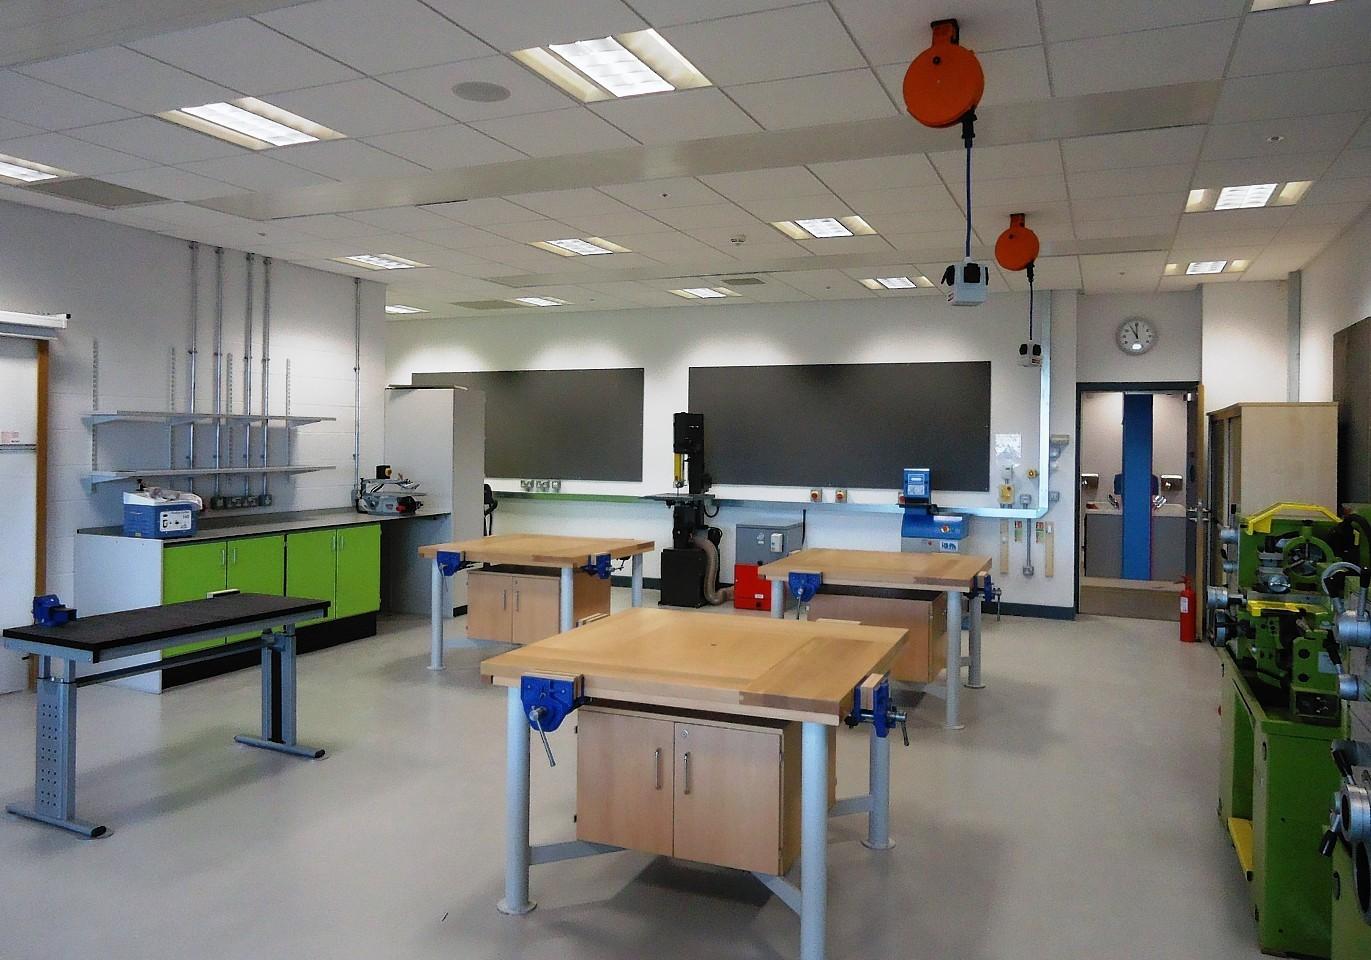 Inside Alford Community Campus